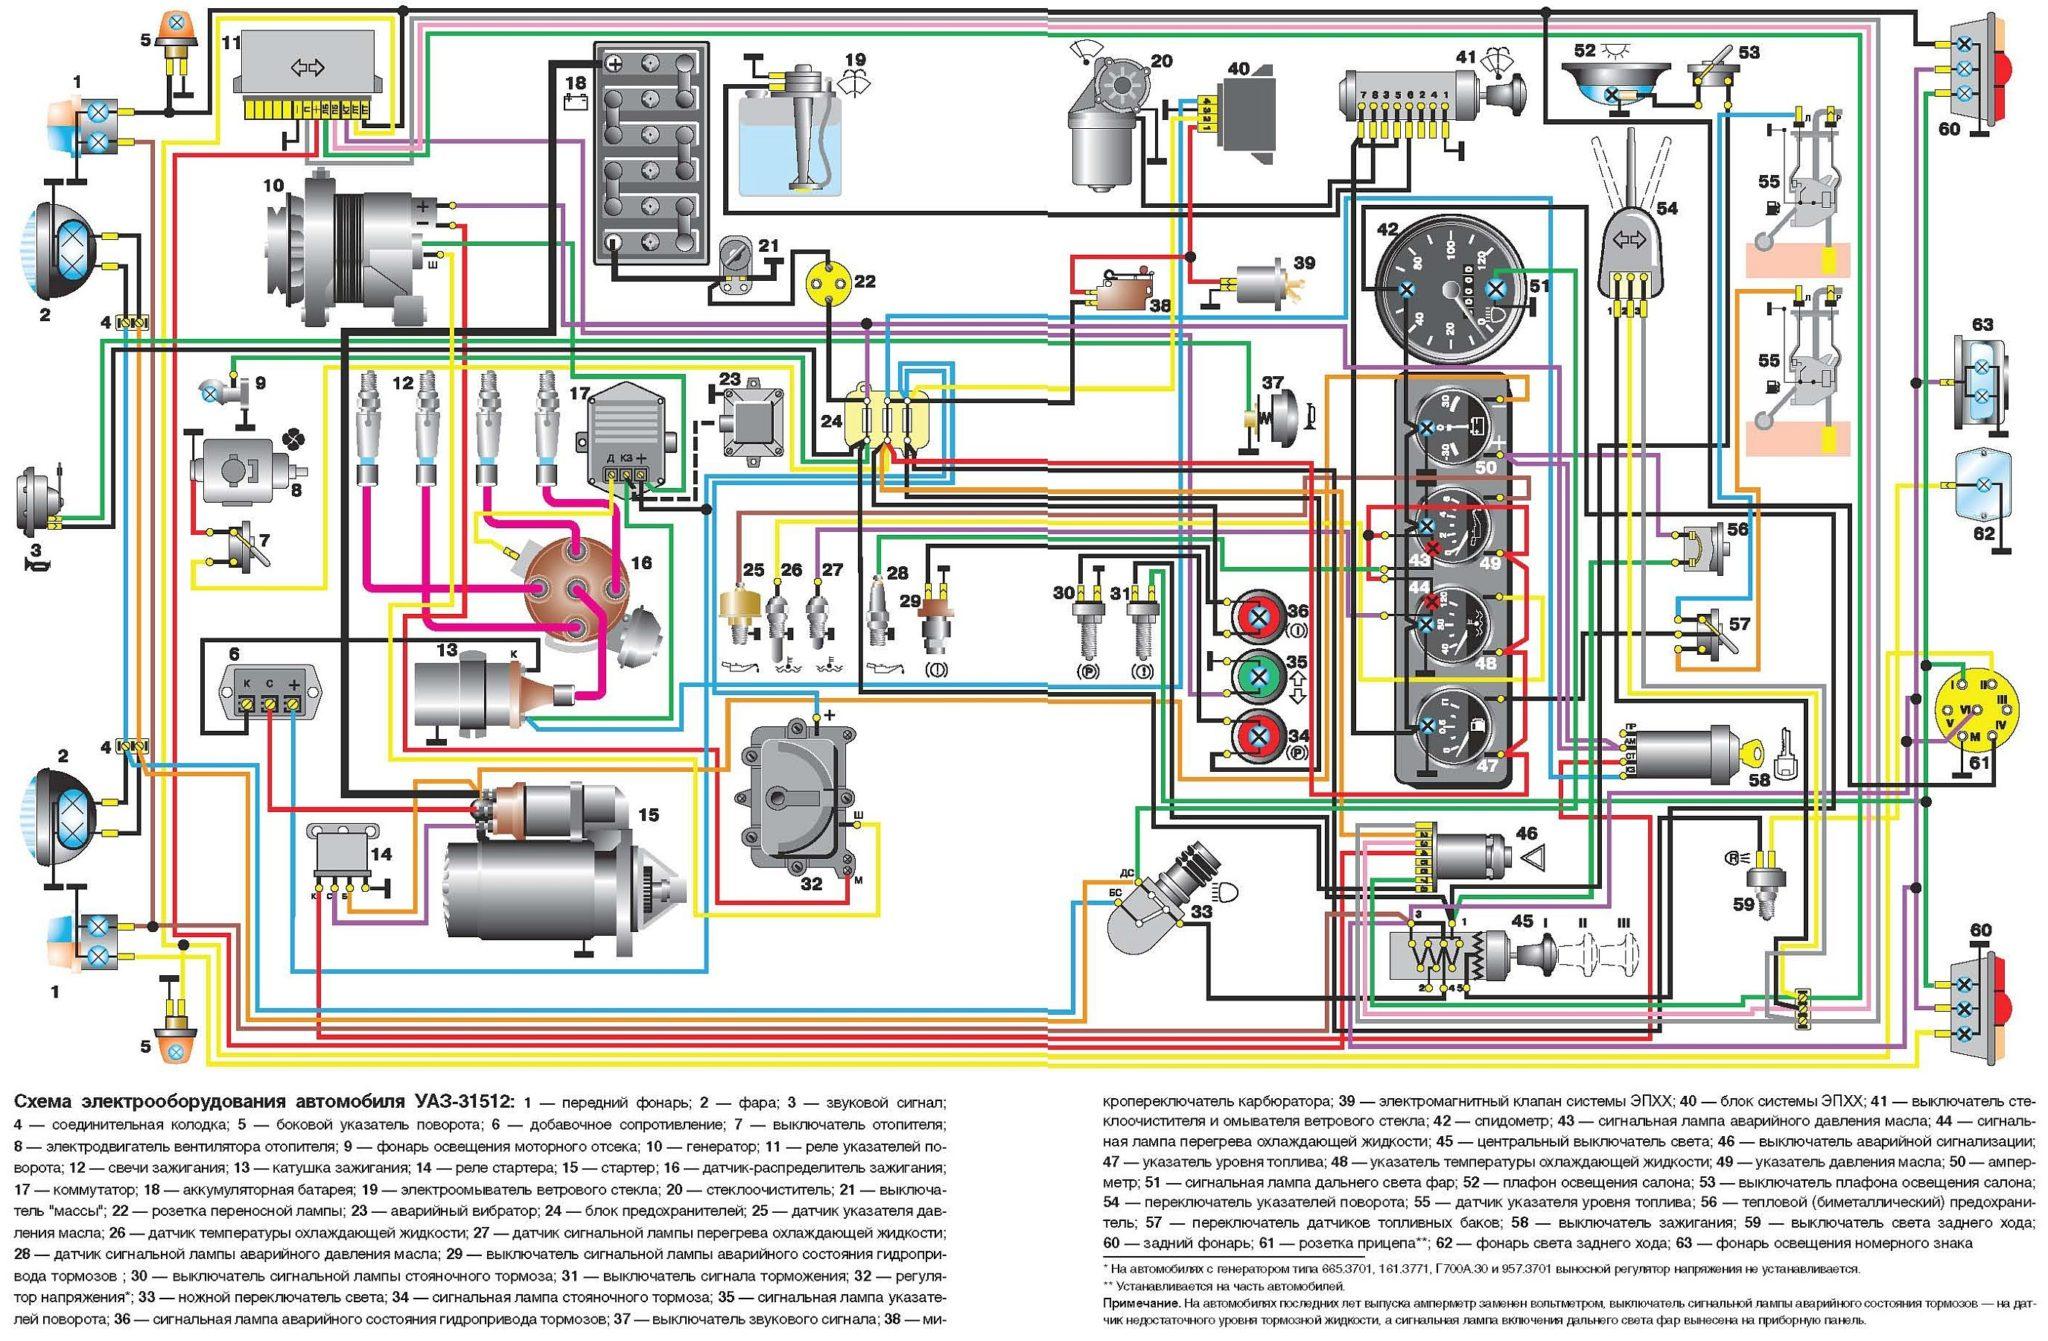 УАЗ-31512 электросхема